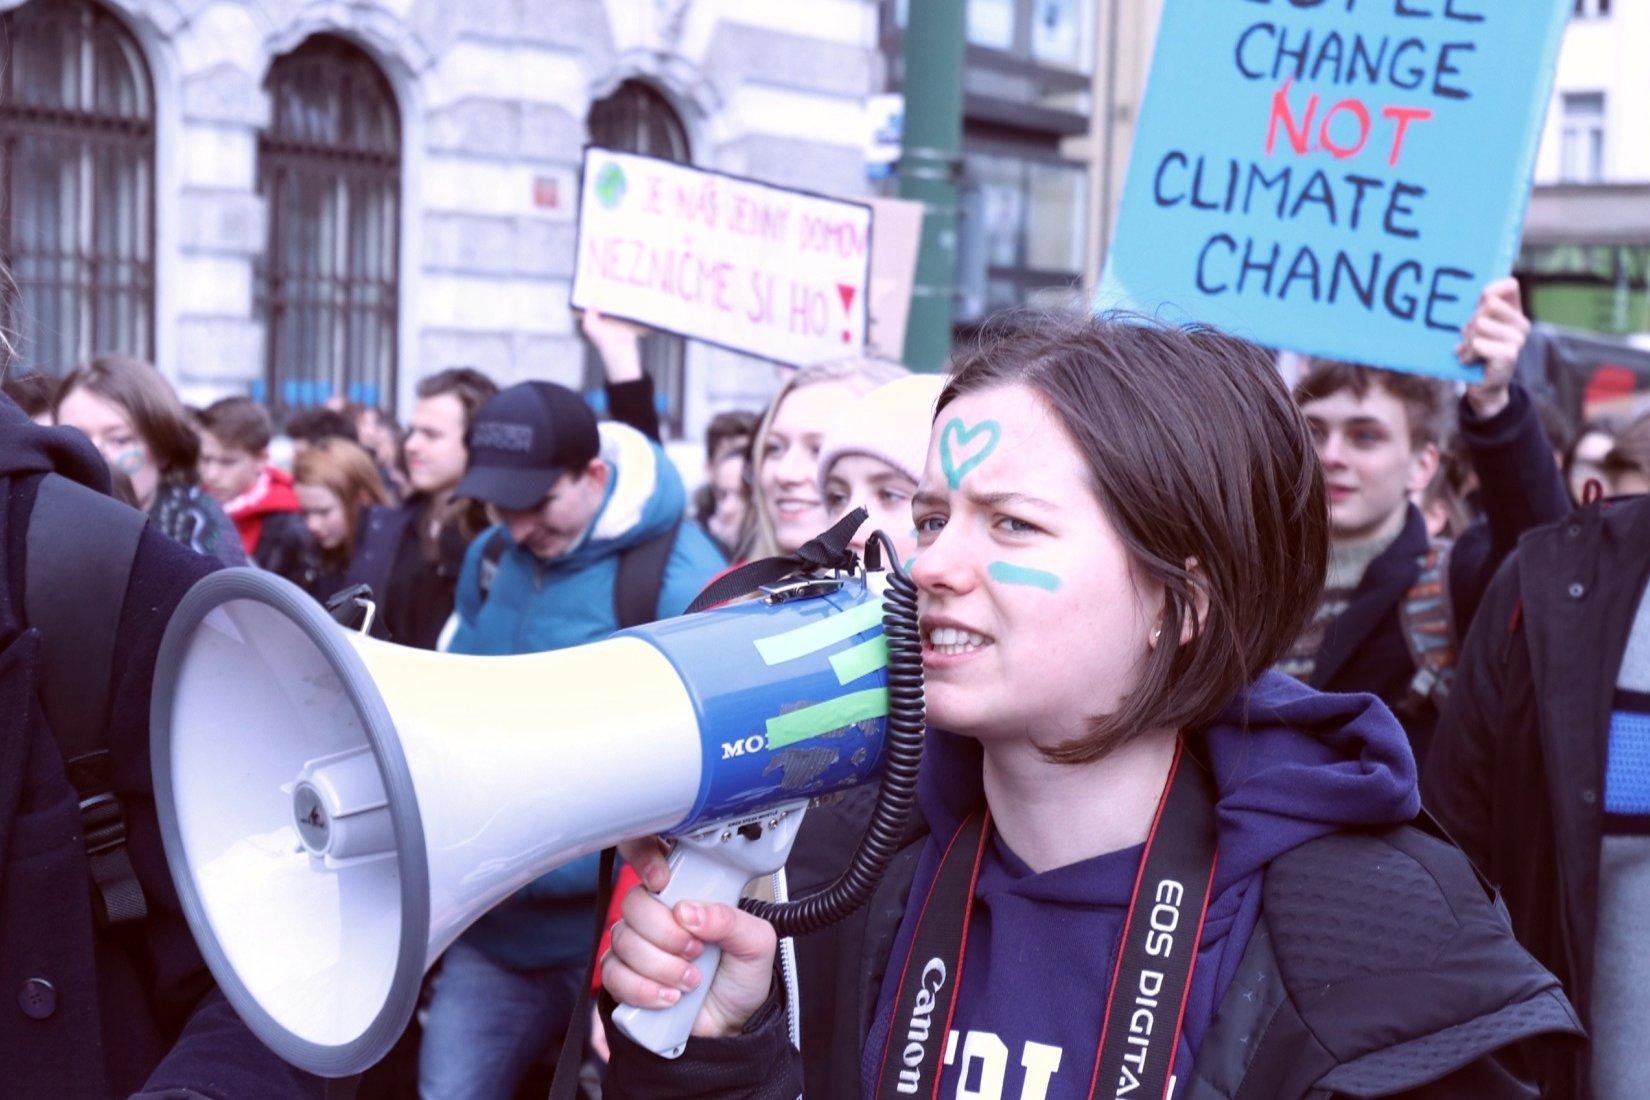 Studentská klimatická stávka Fridays For Future v Praze